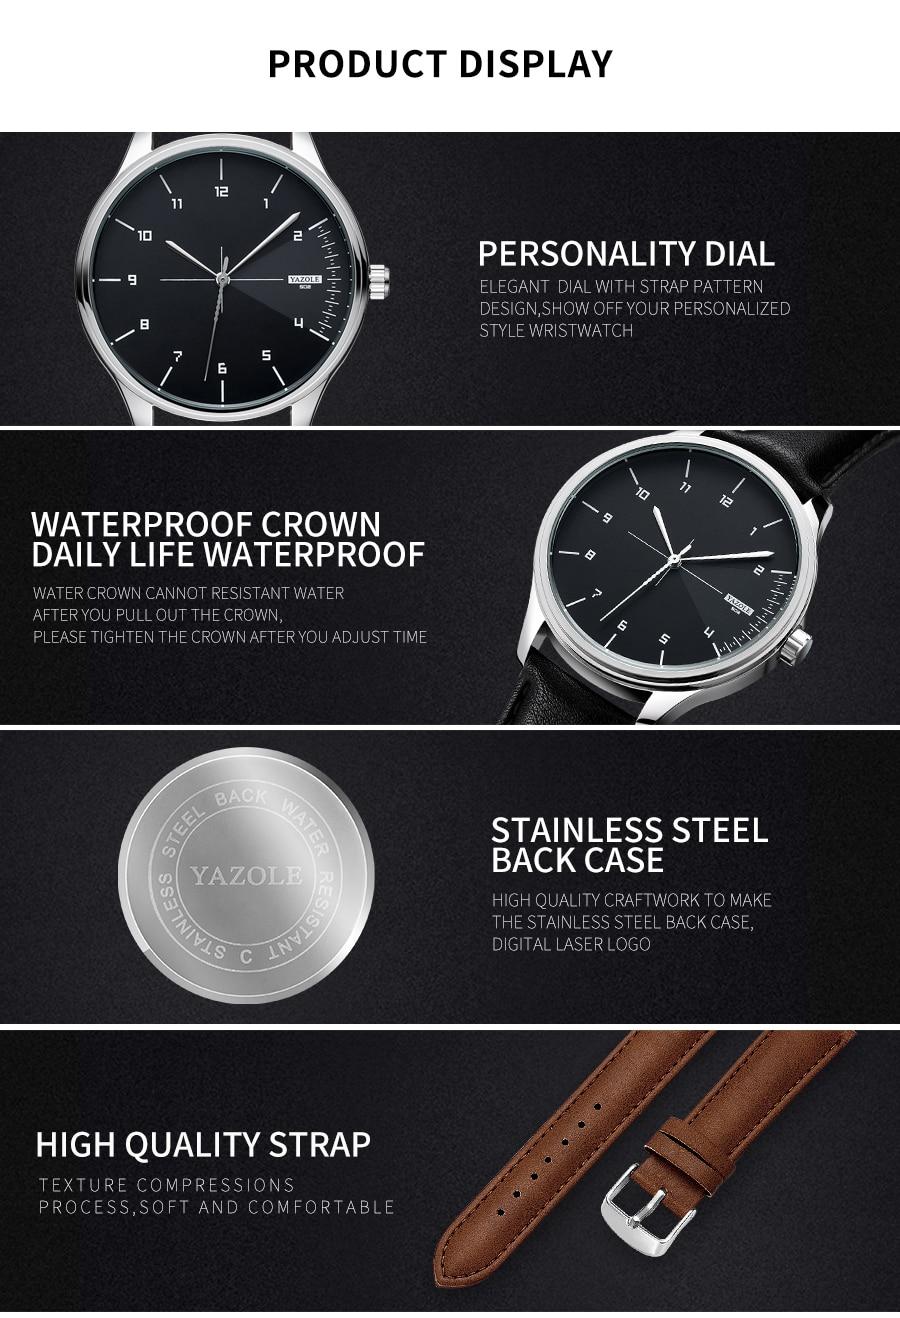 H7041bd679d764922897a3d8e2a59f082w Yazole Watch simple stylish business